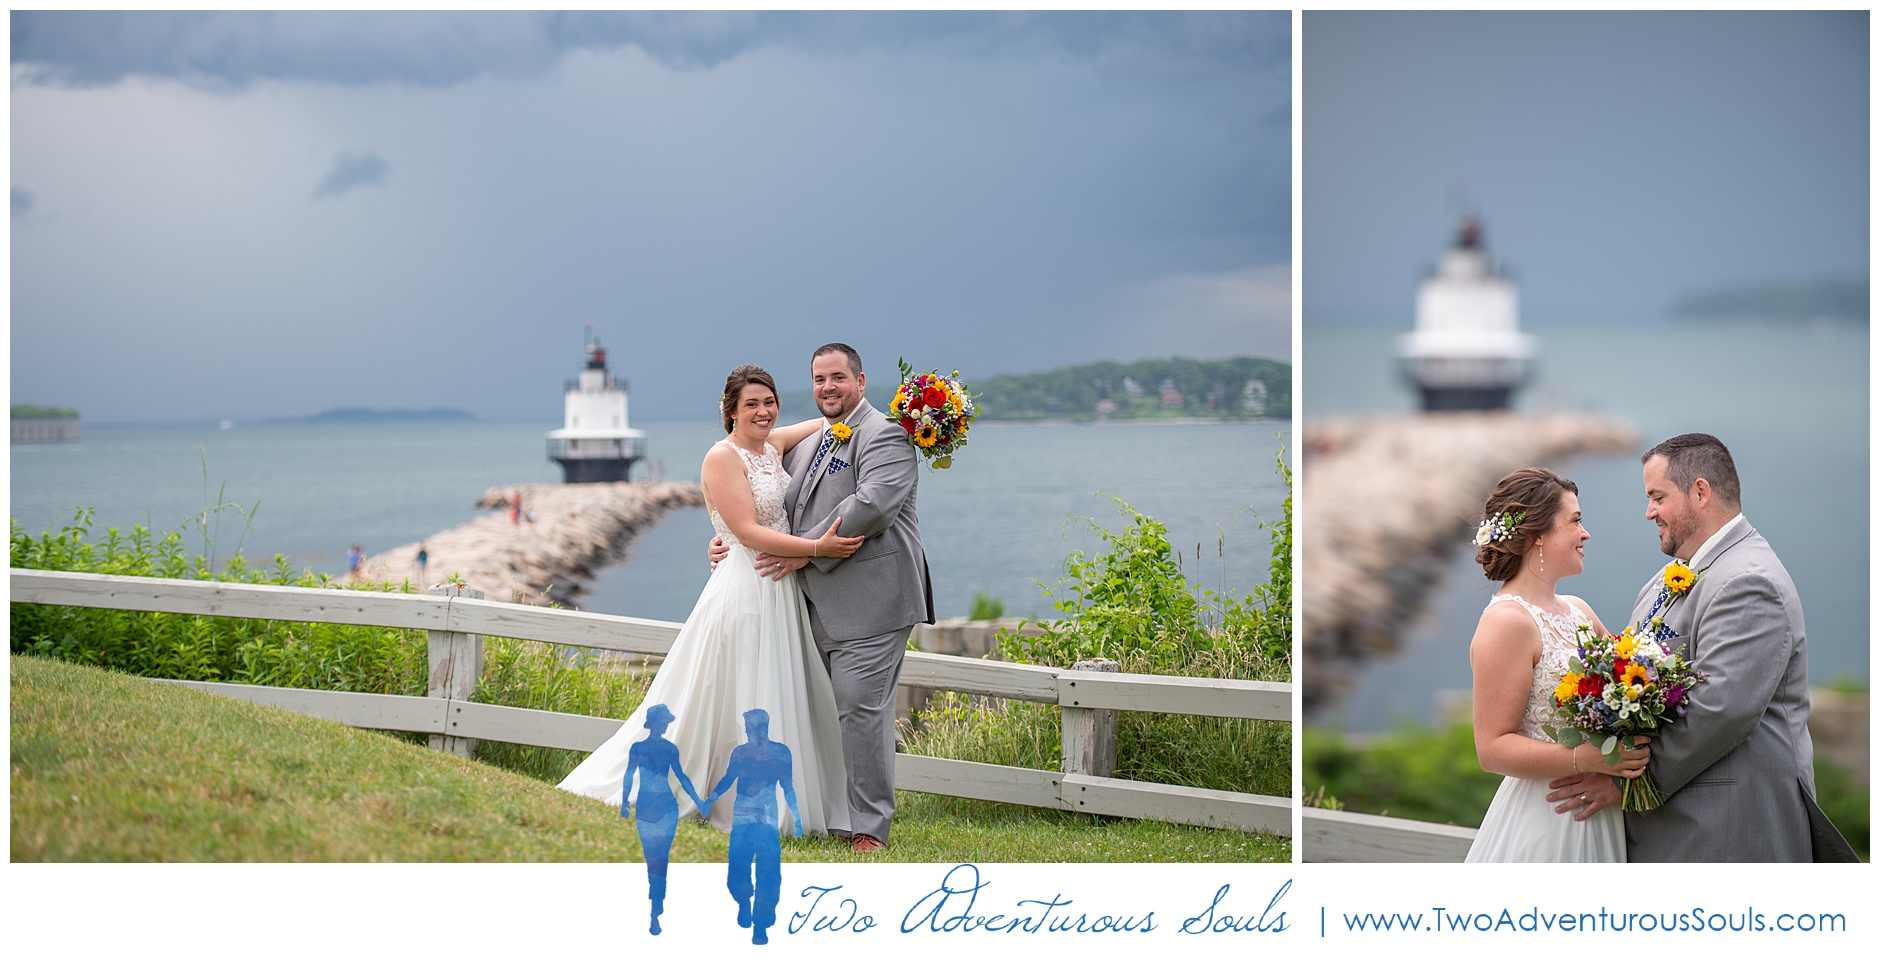 Maine Wedding Photographers, SMCC Wedding Photographers, Southern Maine Community College Wedding Photographers, Two Adventurous Souls-AshleyAaron_0034.jpg